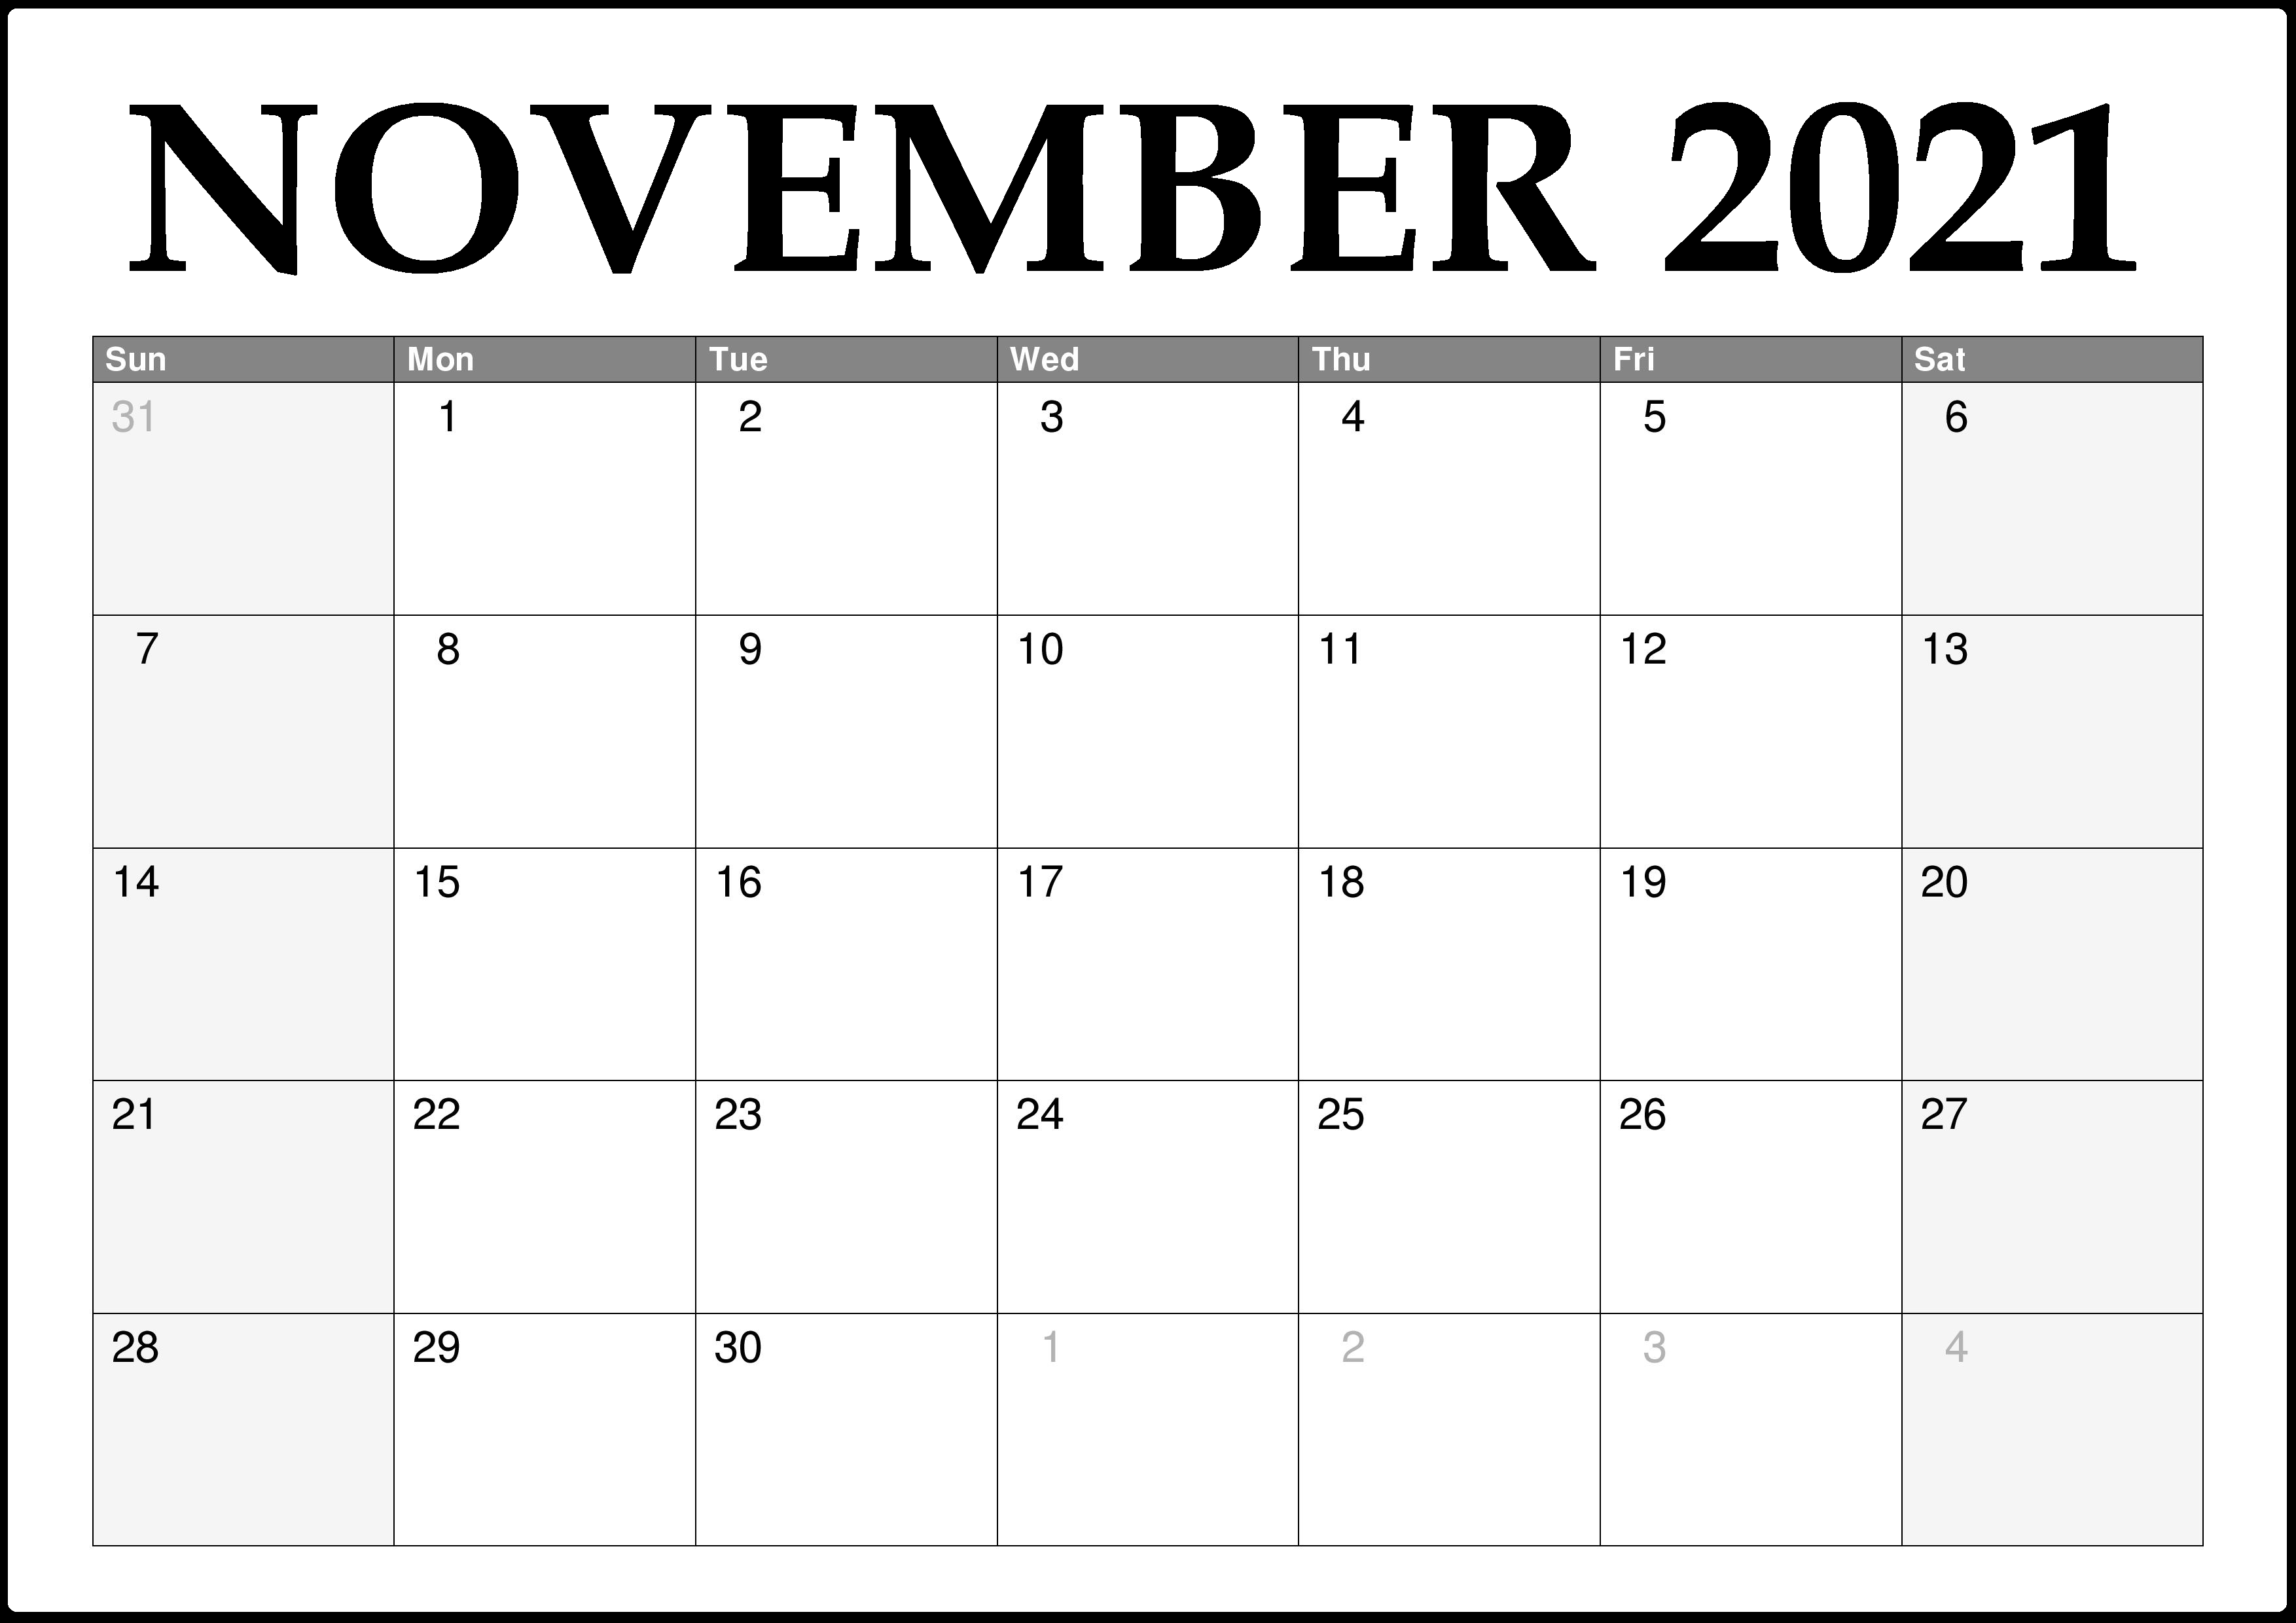 November 2021 Calendar Blank Powerpoint Publisher